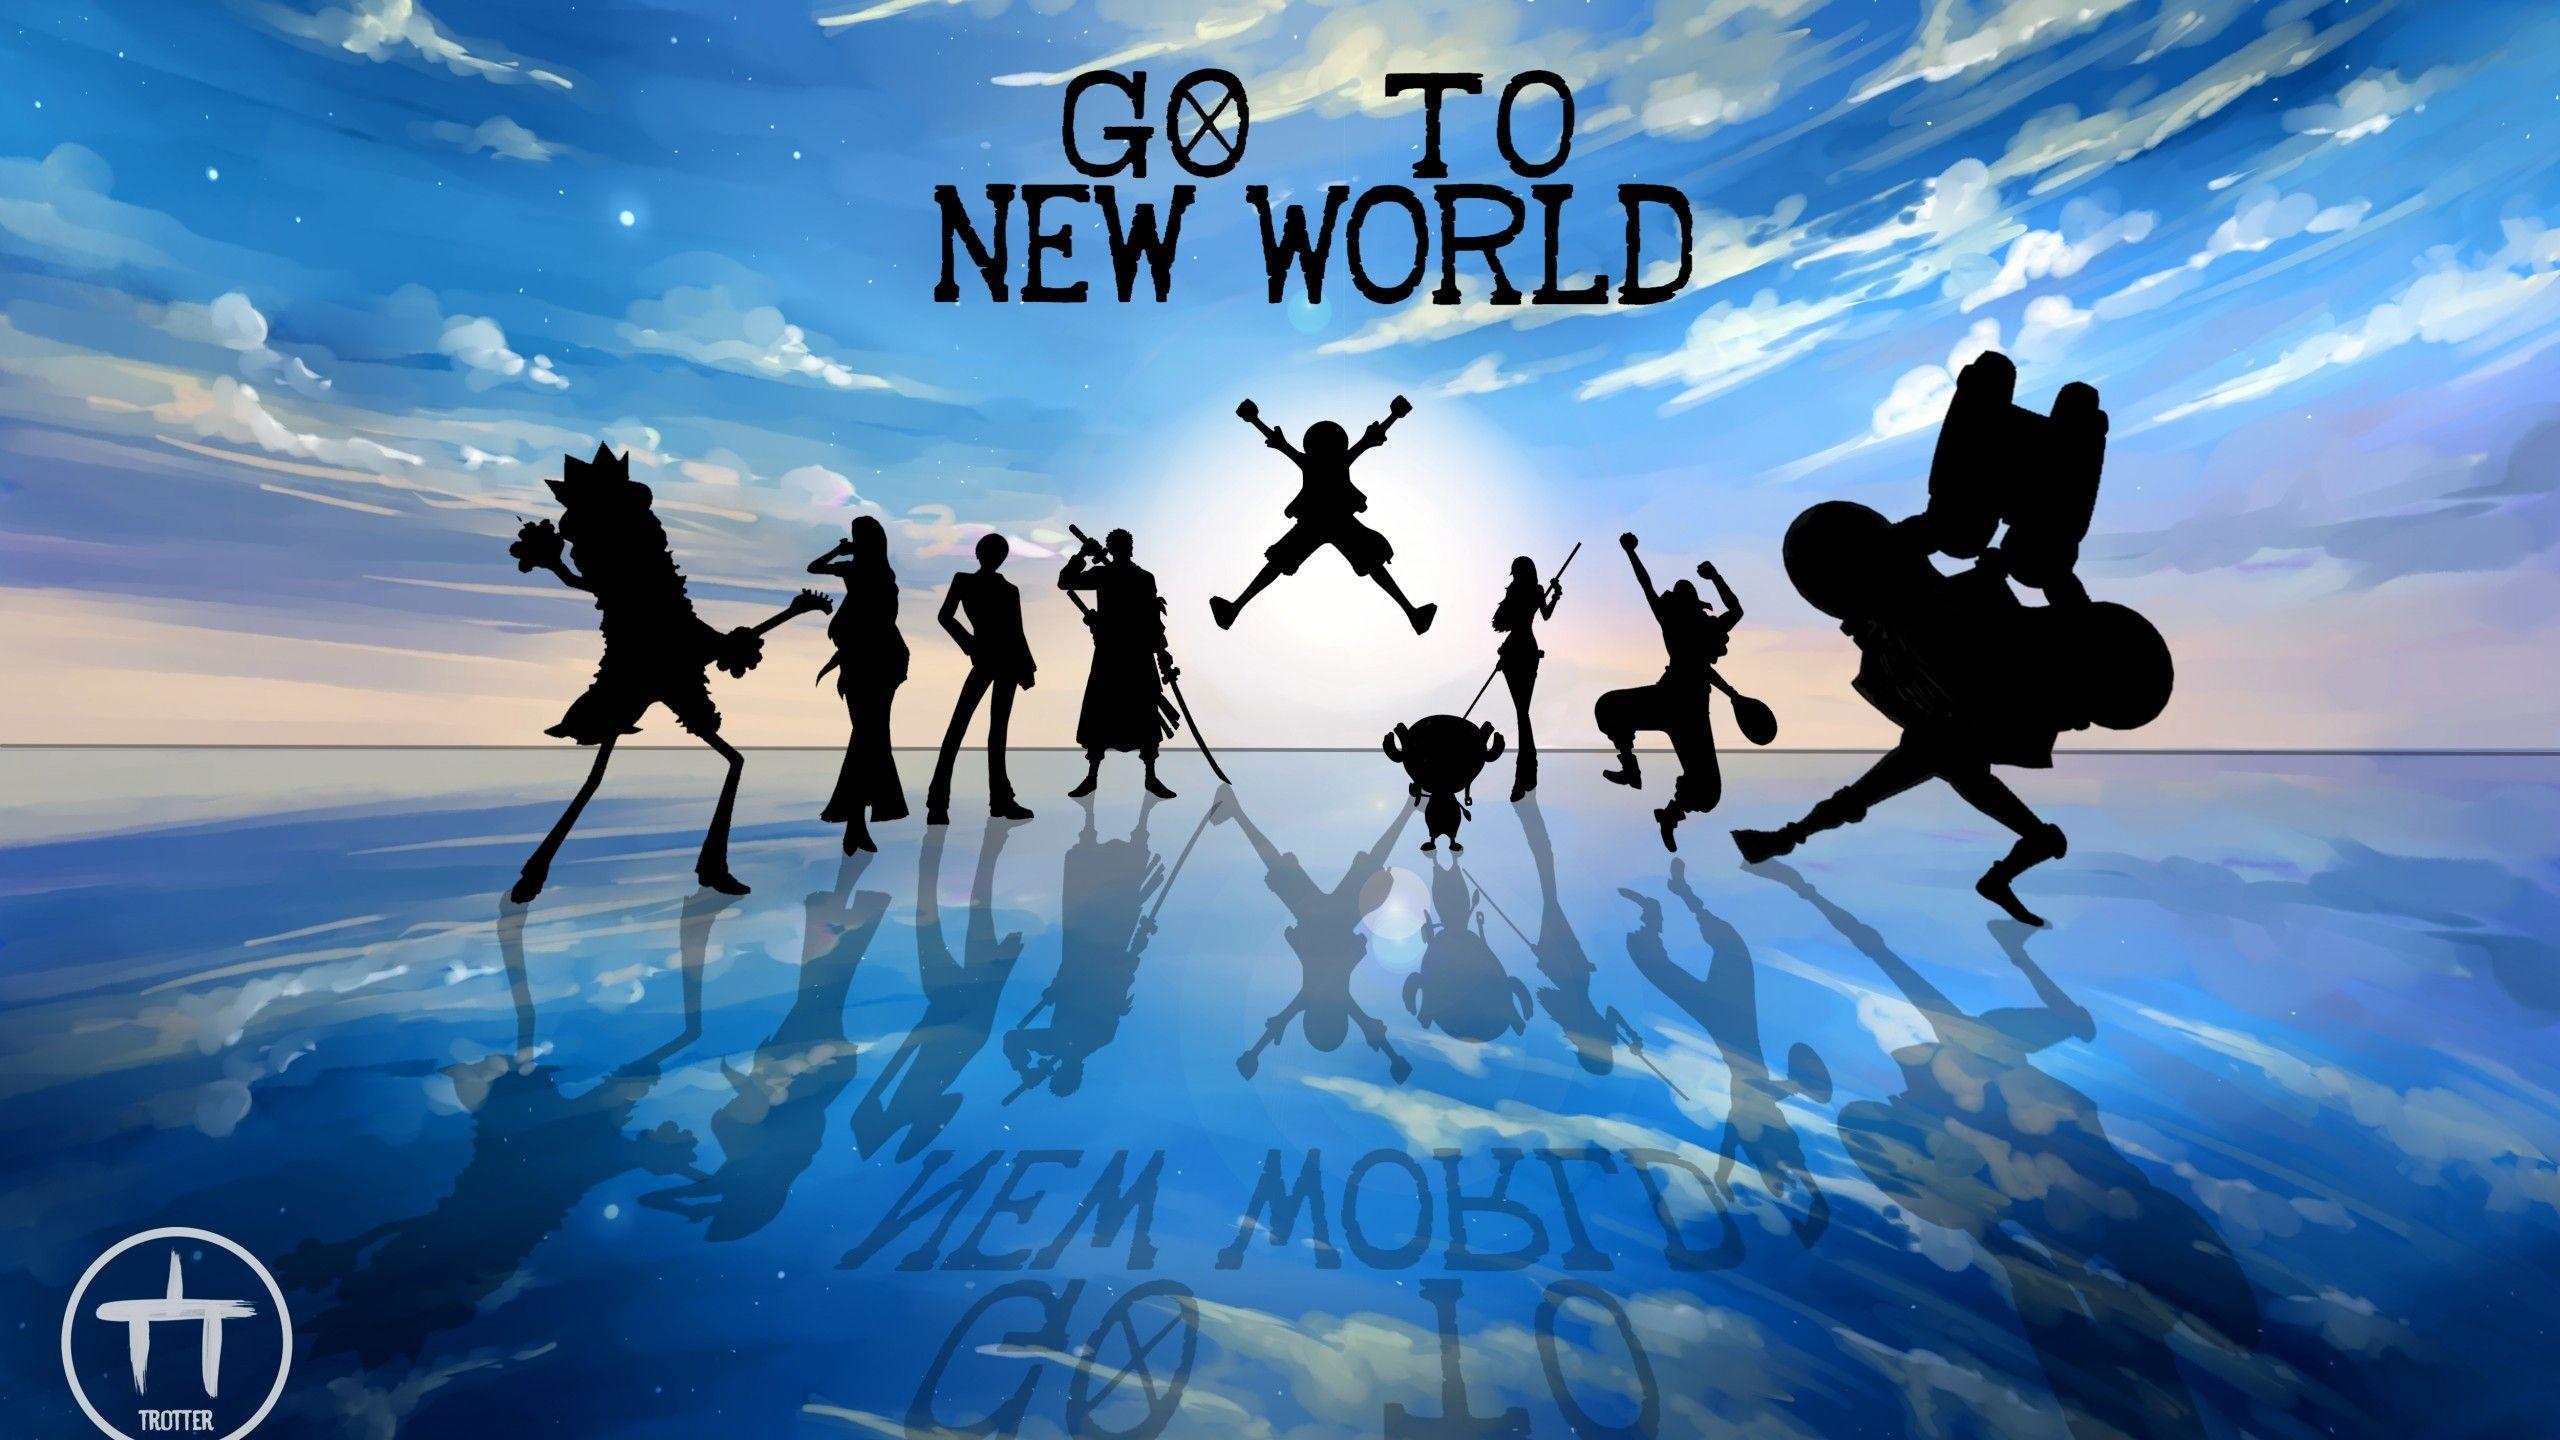 2560x1440 Anime One Piece Wallpaper Brooks One Piece One Piece New World World Wallpaper